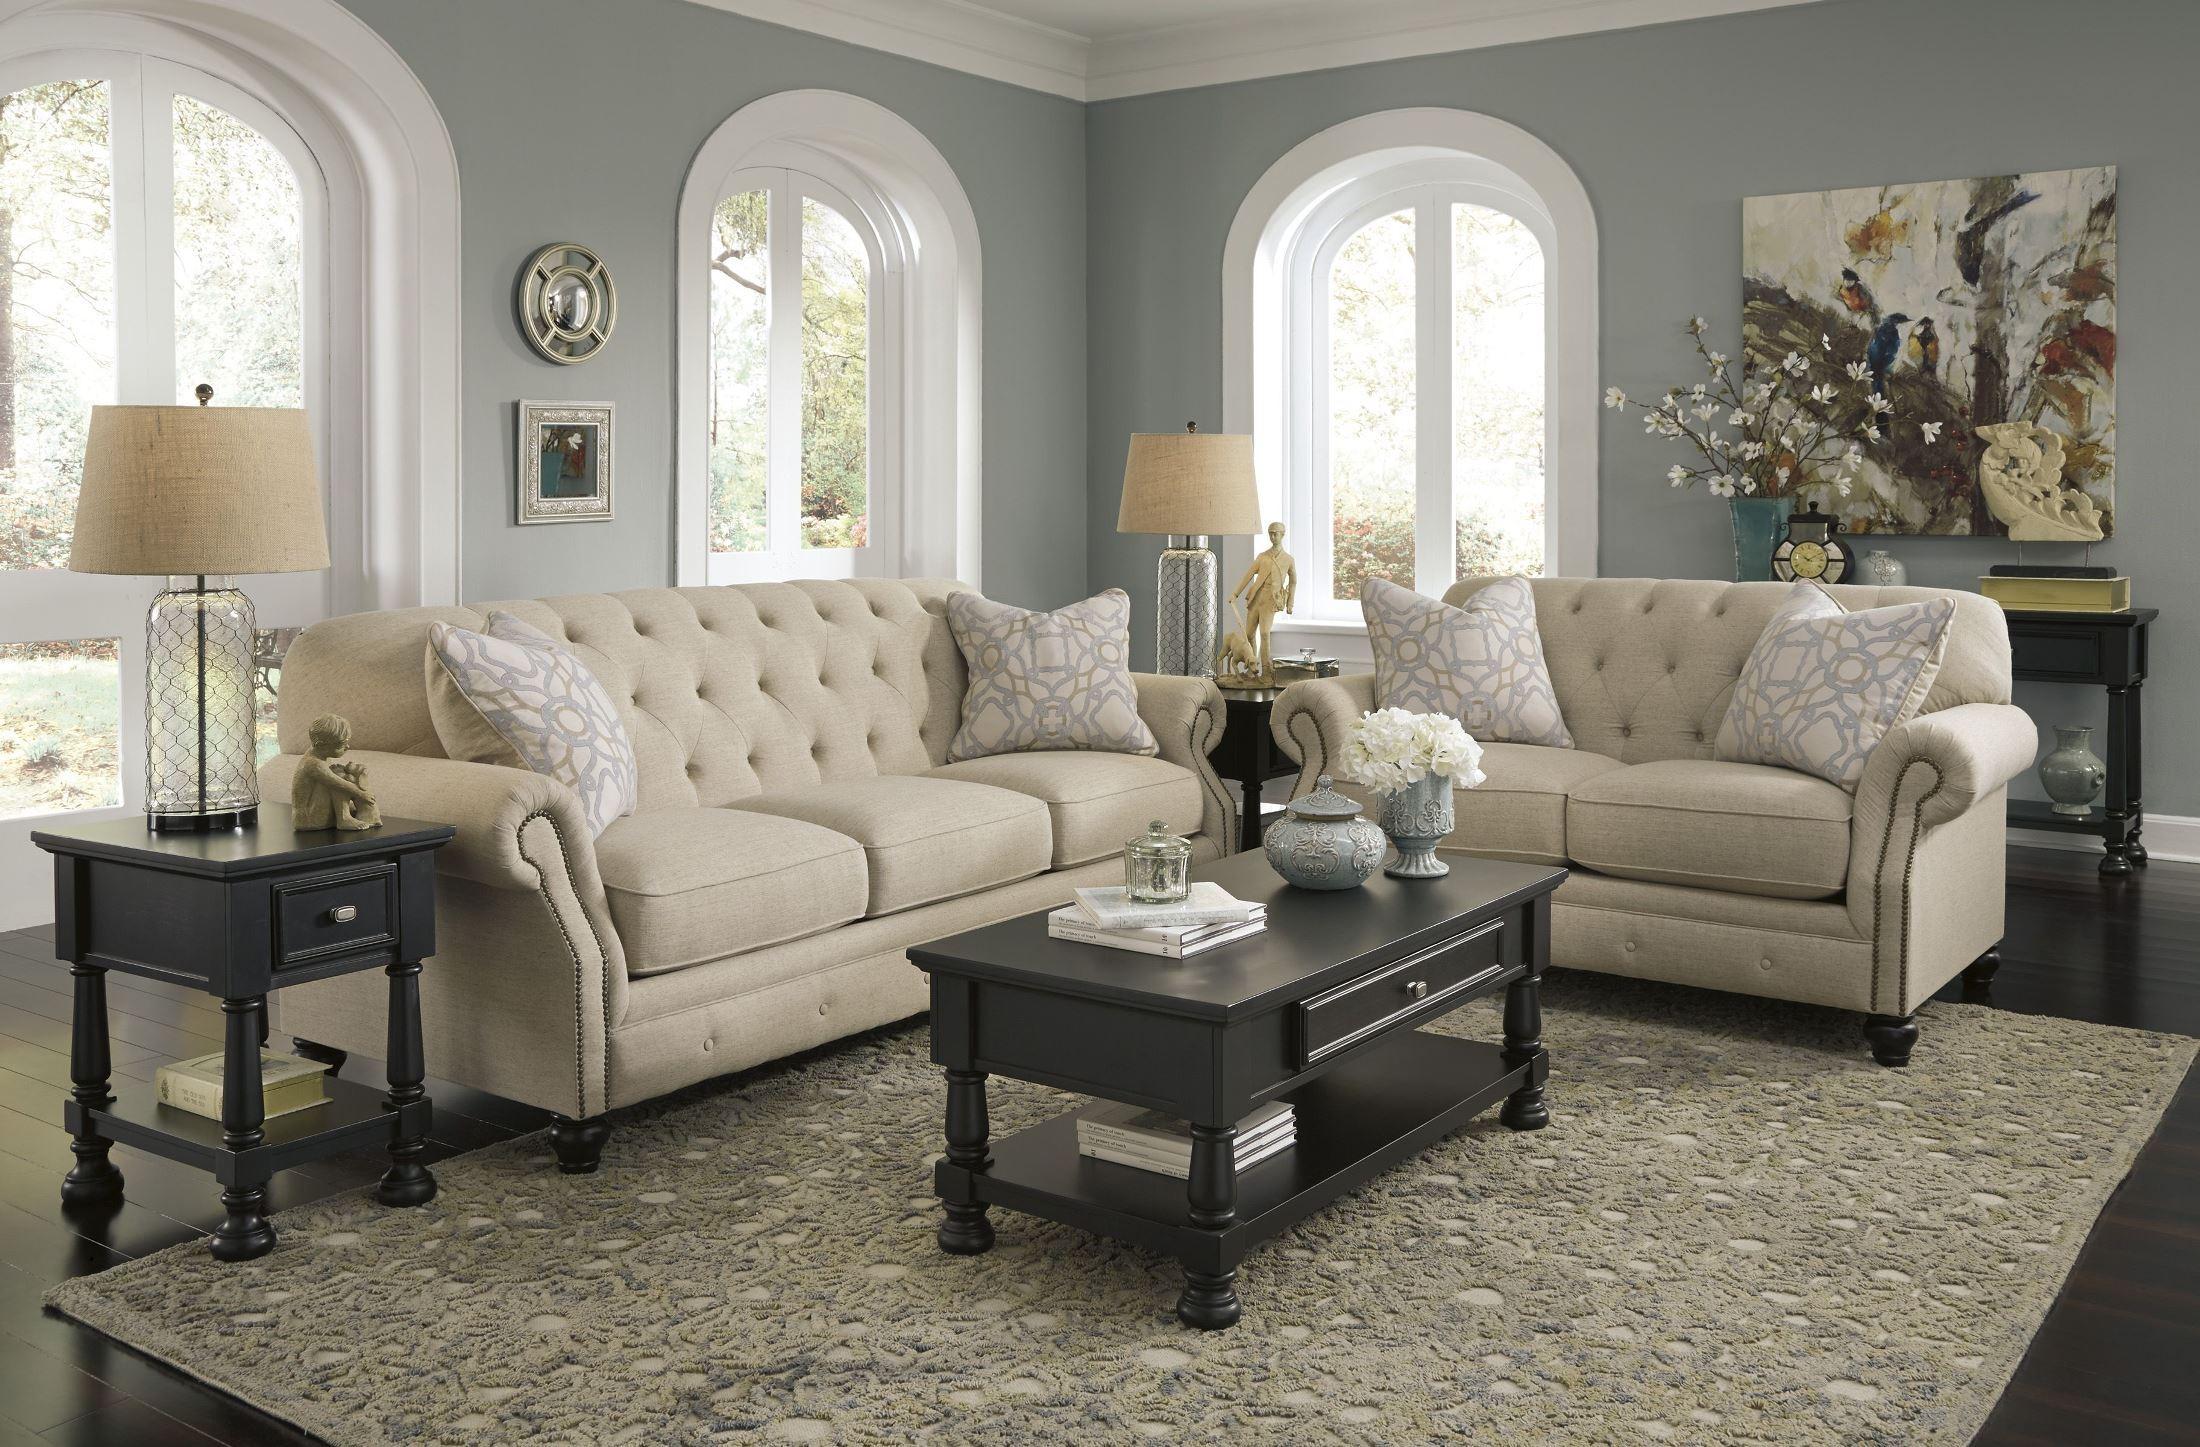 Kieran Natural Living Room Set from Ashley 4400038